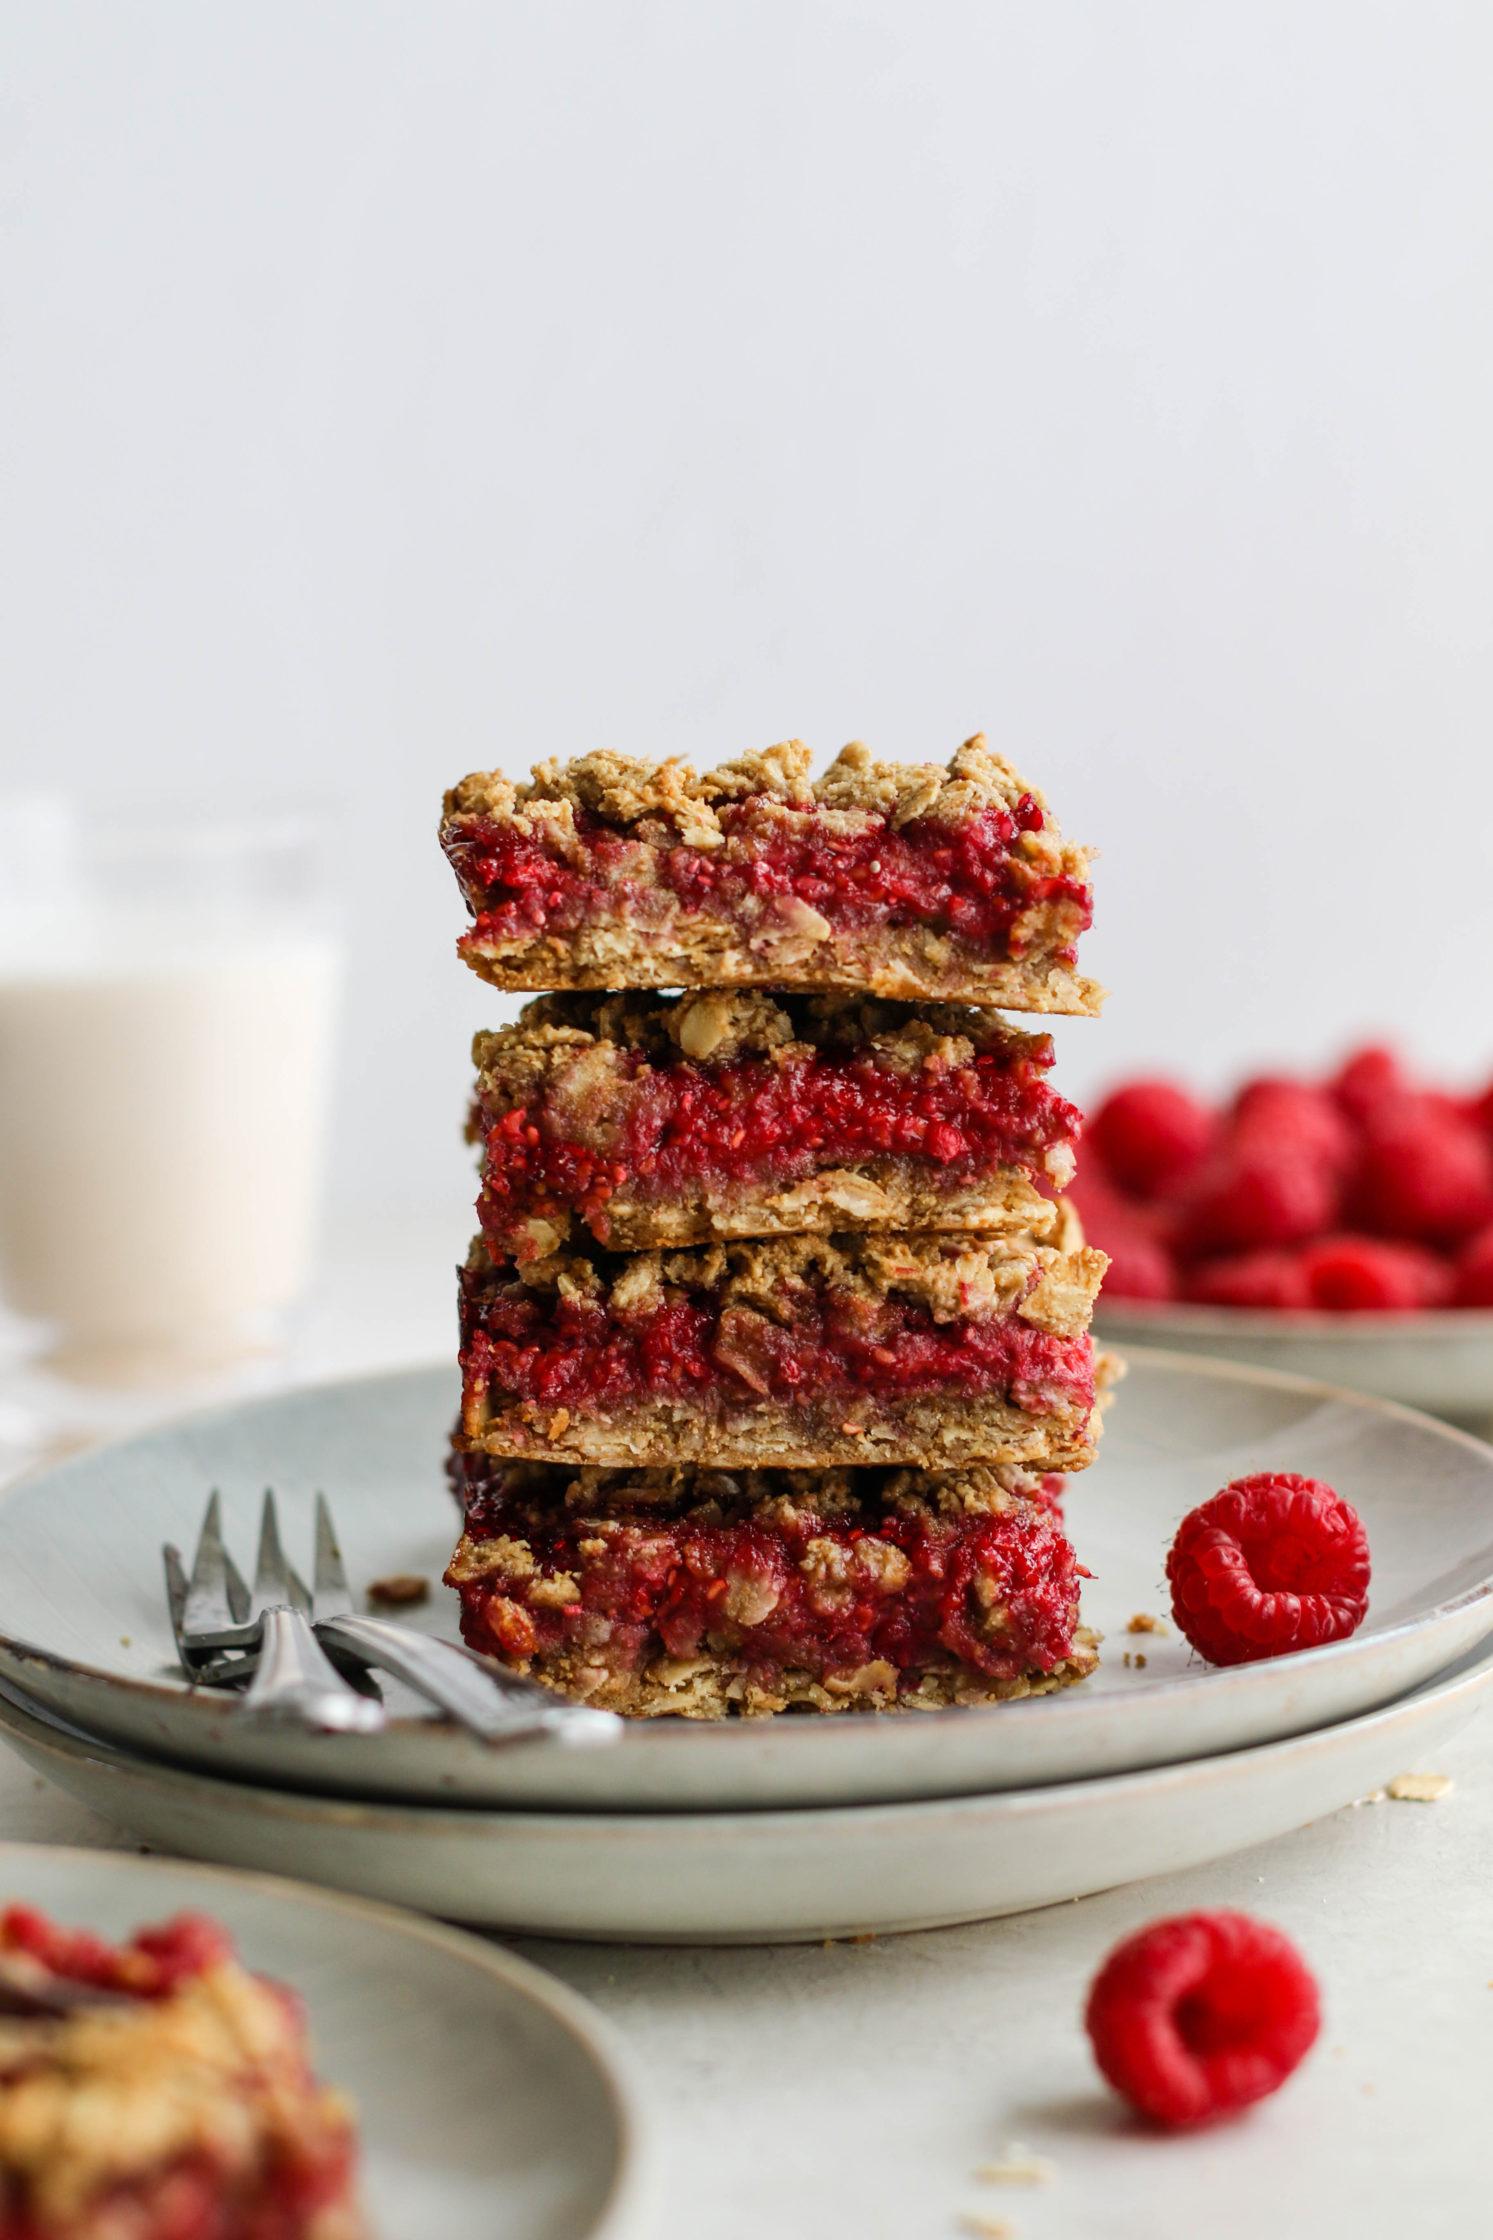 Raspberry Oat Crumble Bars by Flora & Vino